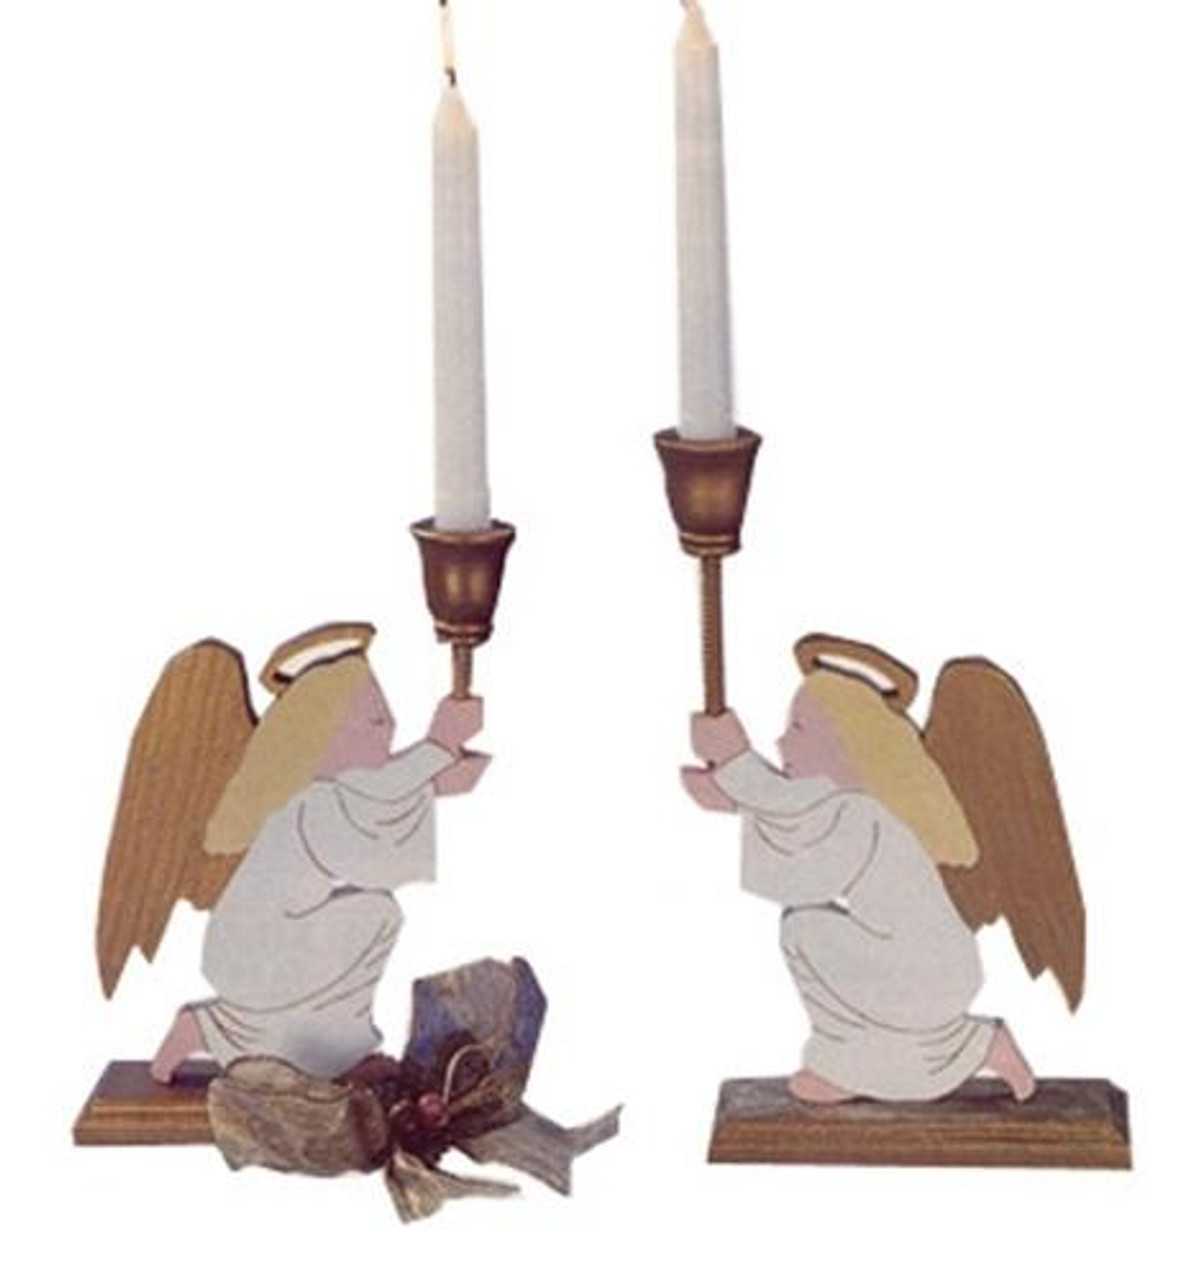 Cherry Tree Toys Angel Candleholder Plan